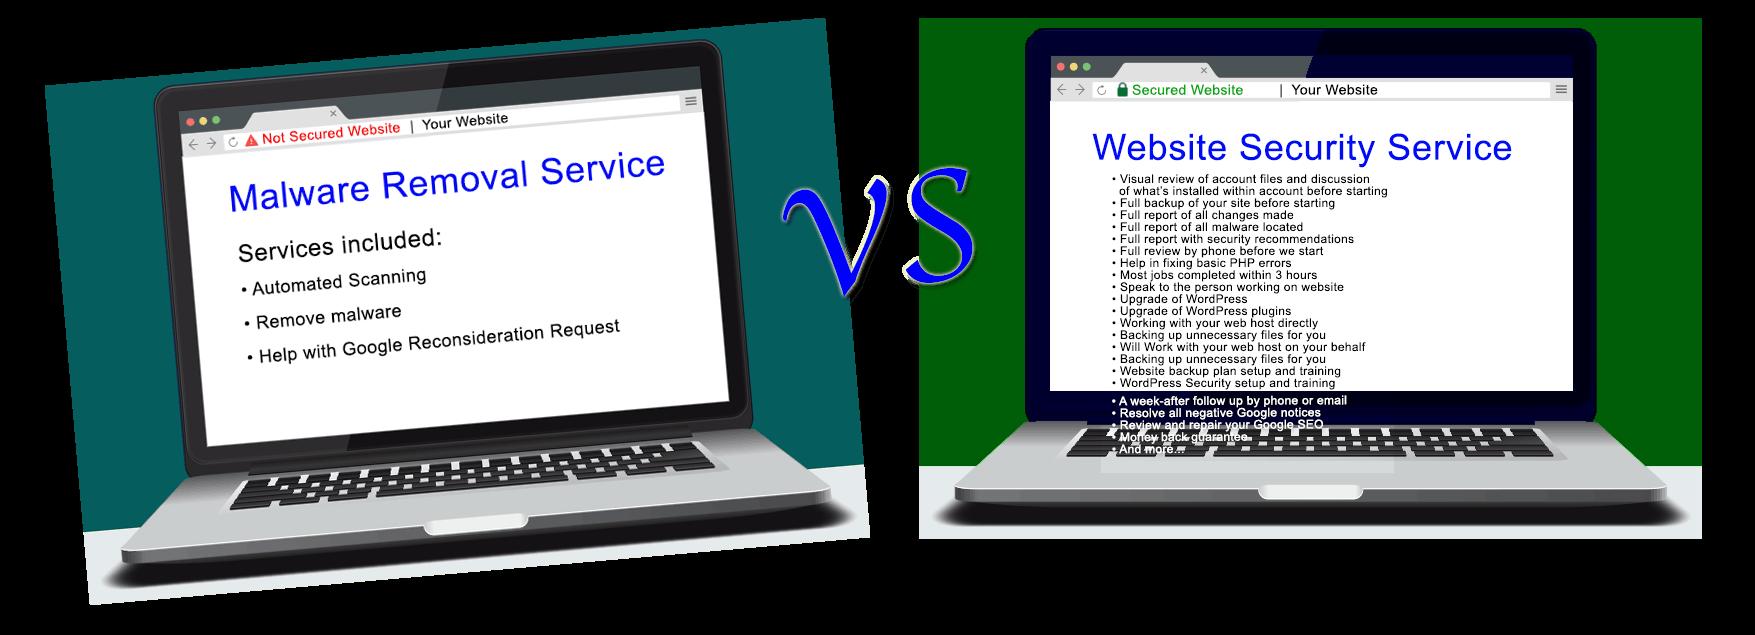 malware removal service versus website security service